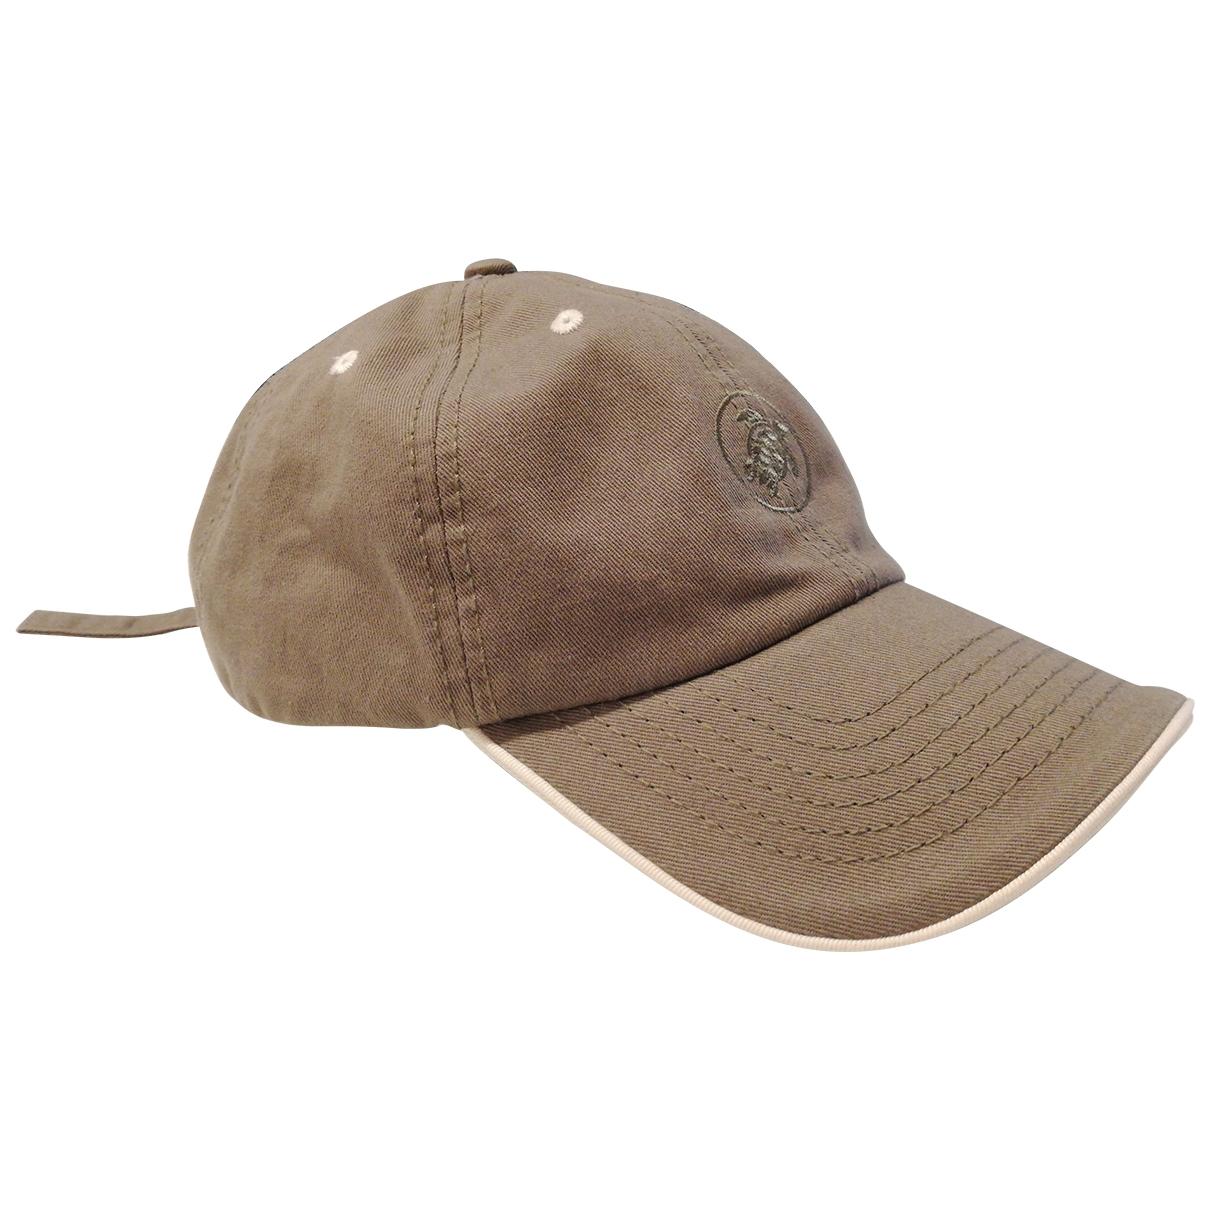 Sombrero / gorro de Lona Vilebrequin